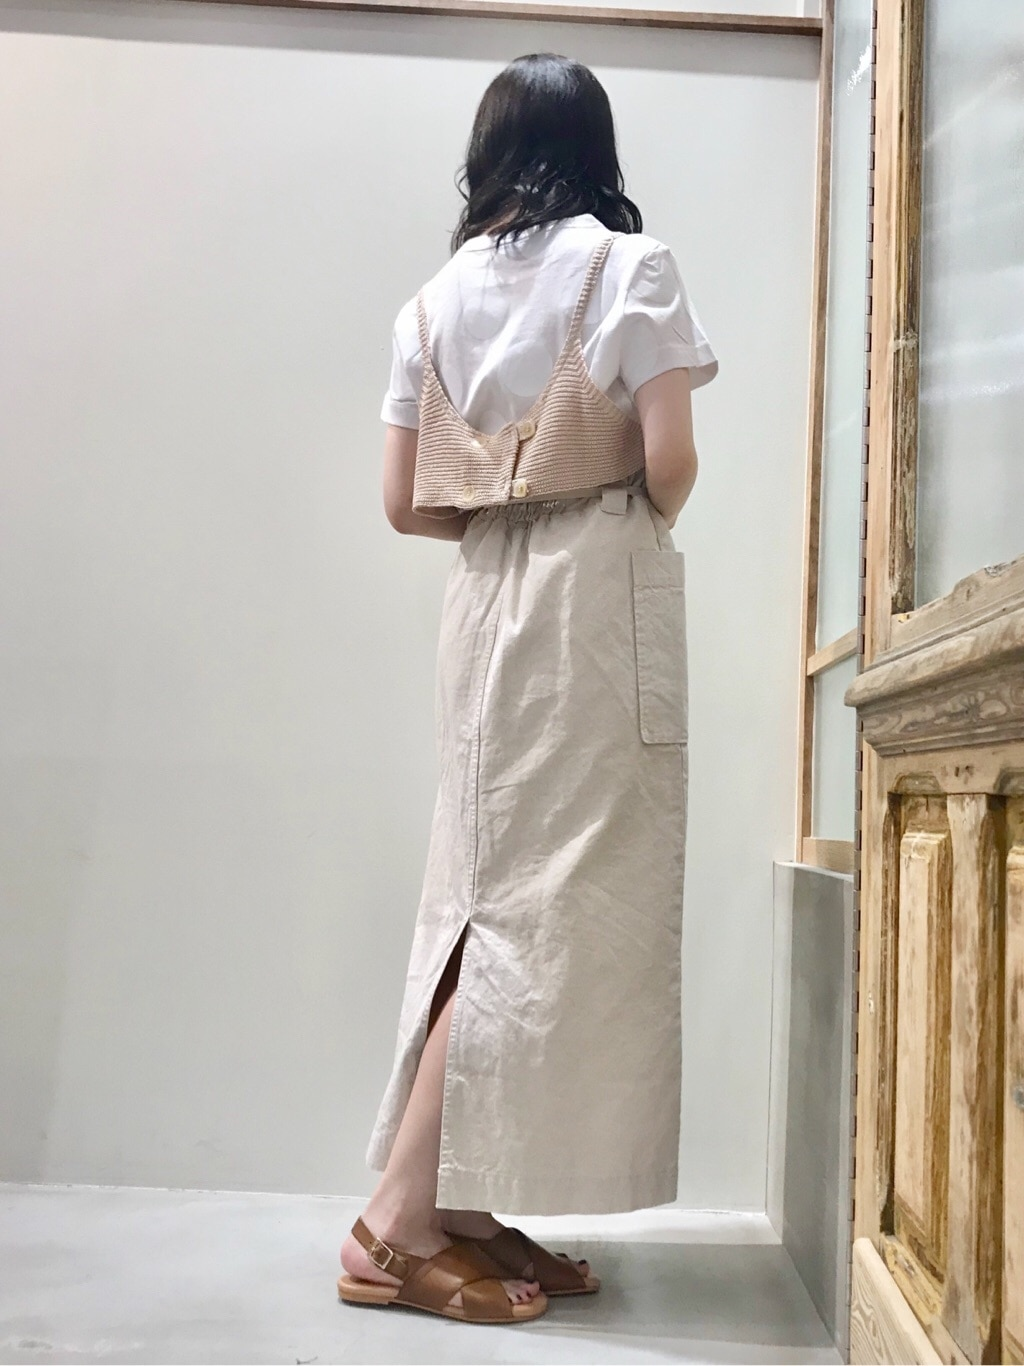 bulle de savon 渋谷スクランブルスクエア 身長:153cm 2020.07.28